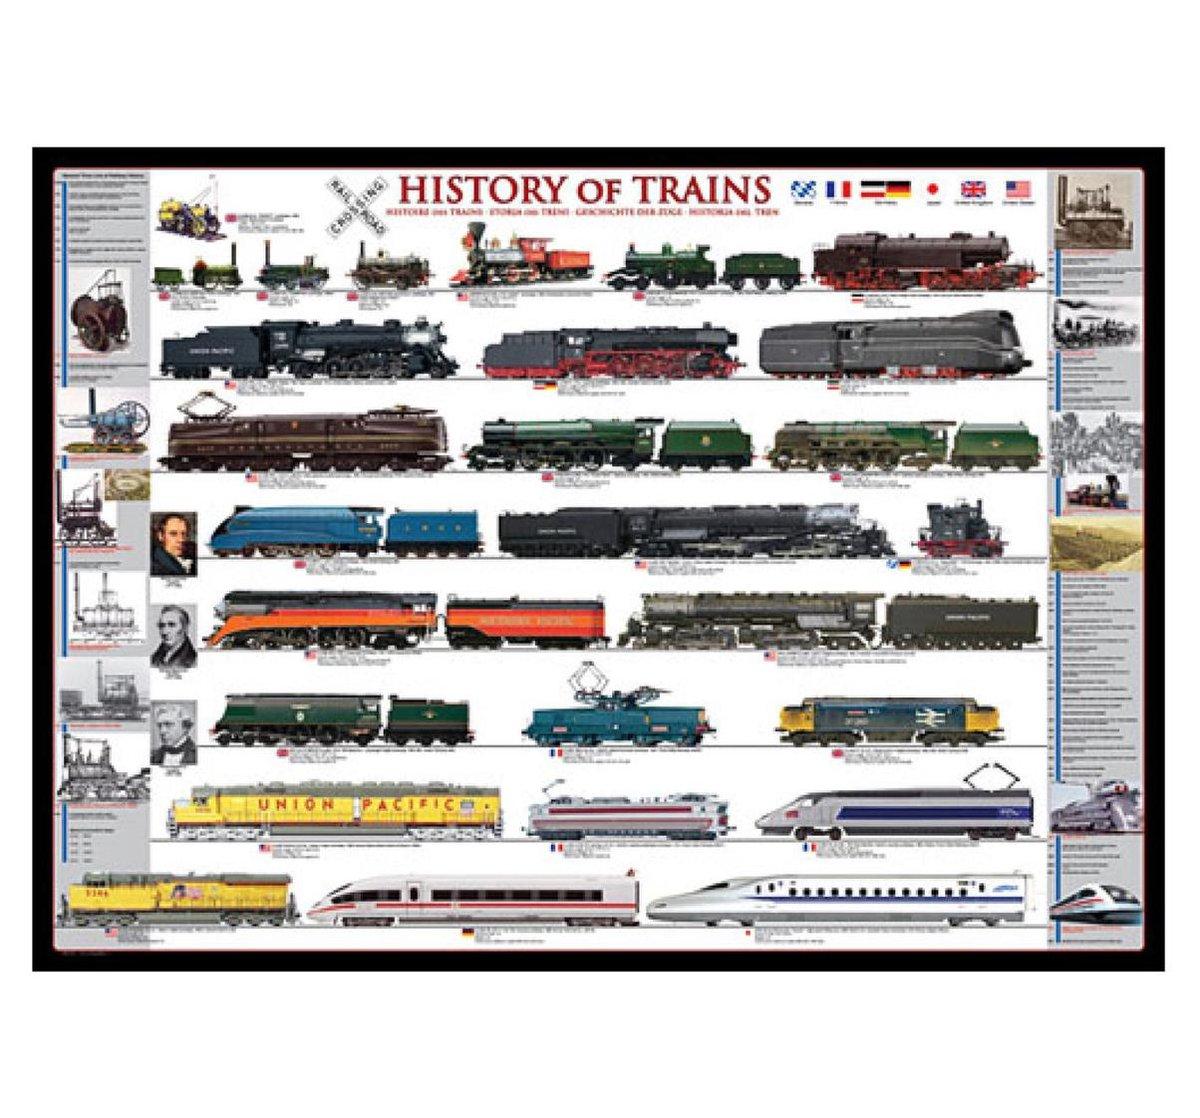 Eur-6000-0251,Puzzel history of trains - eurographics- 1000 stuks